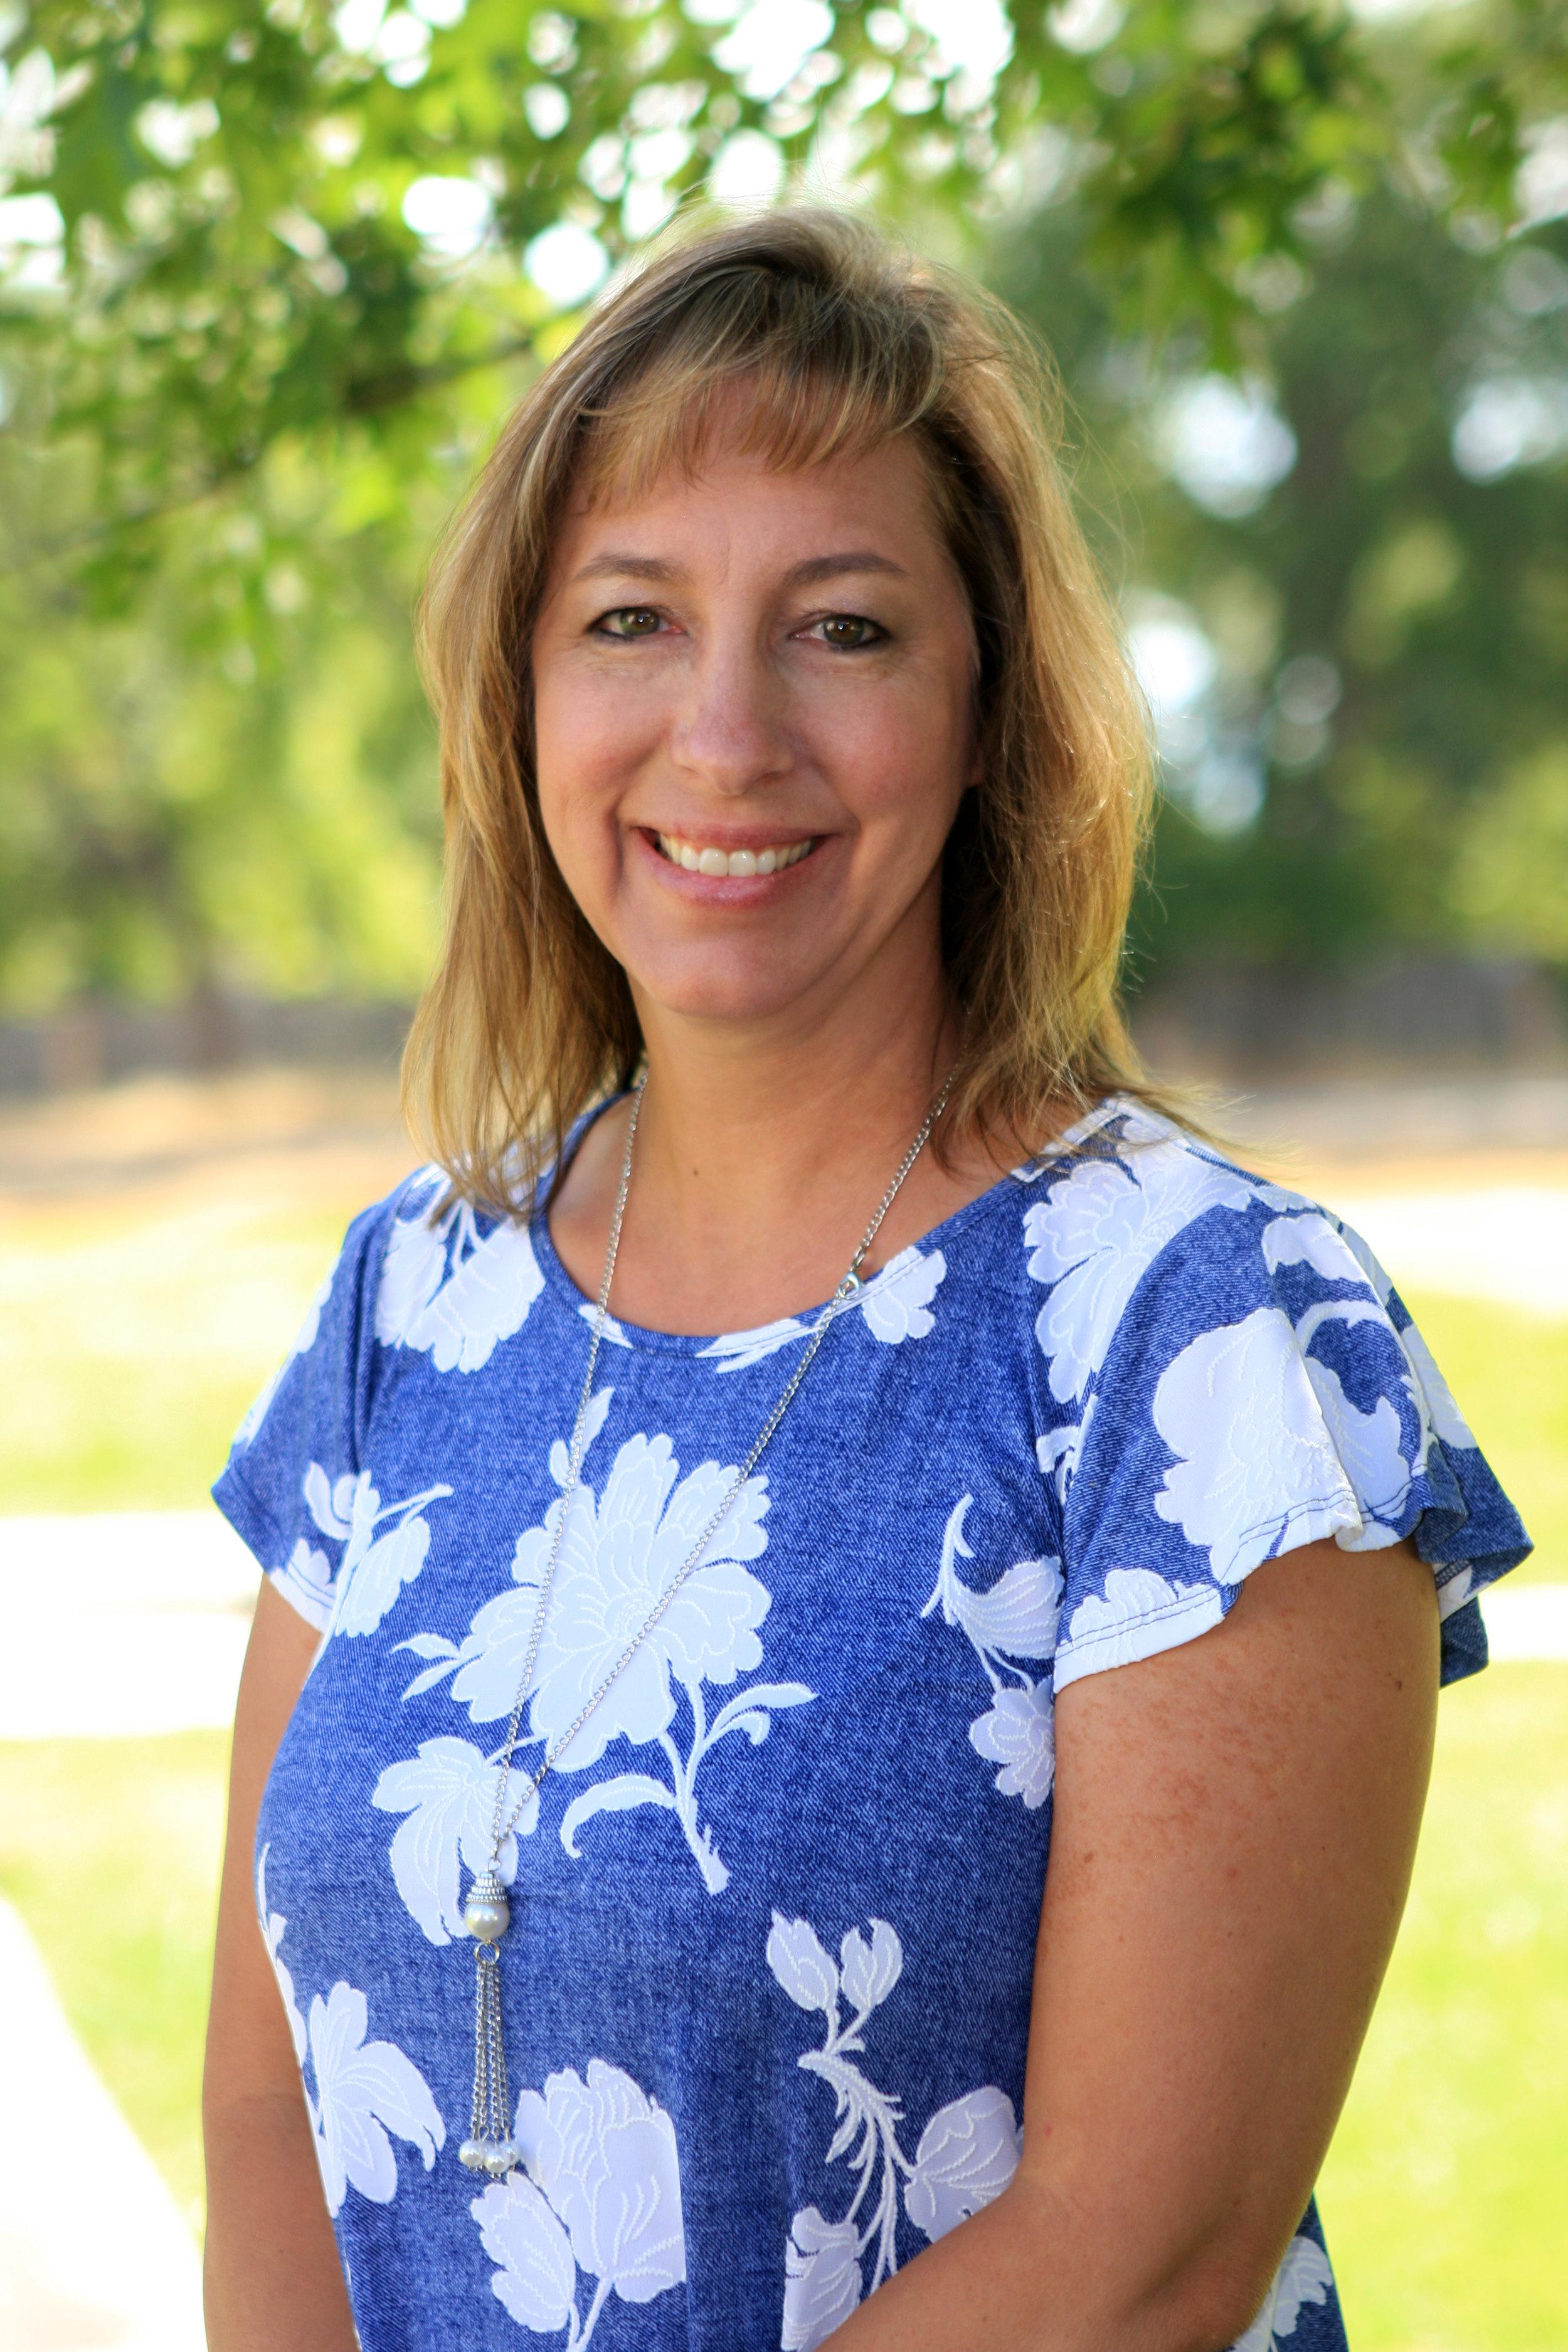 <p><strong>Marjie Lyter</strong><br>Teacher<br><a href=mailto:marjiel@ndaemail.com>marjiel@ndaemail.com</a></p>